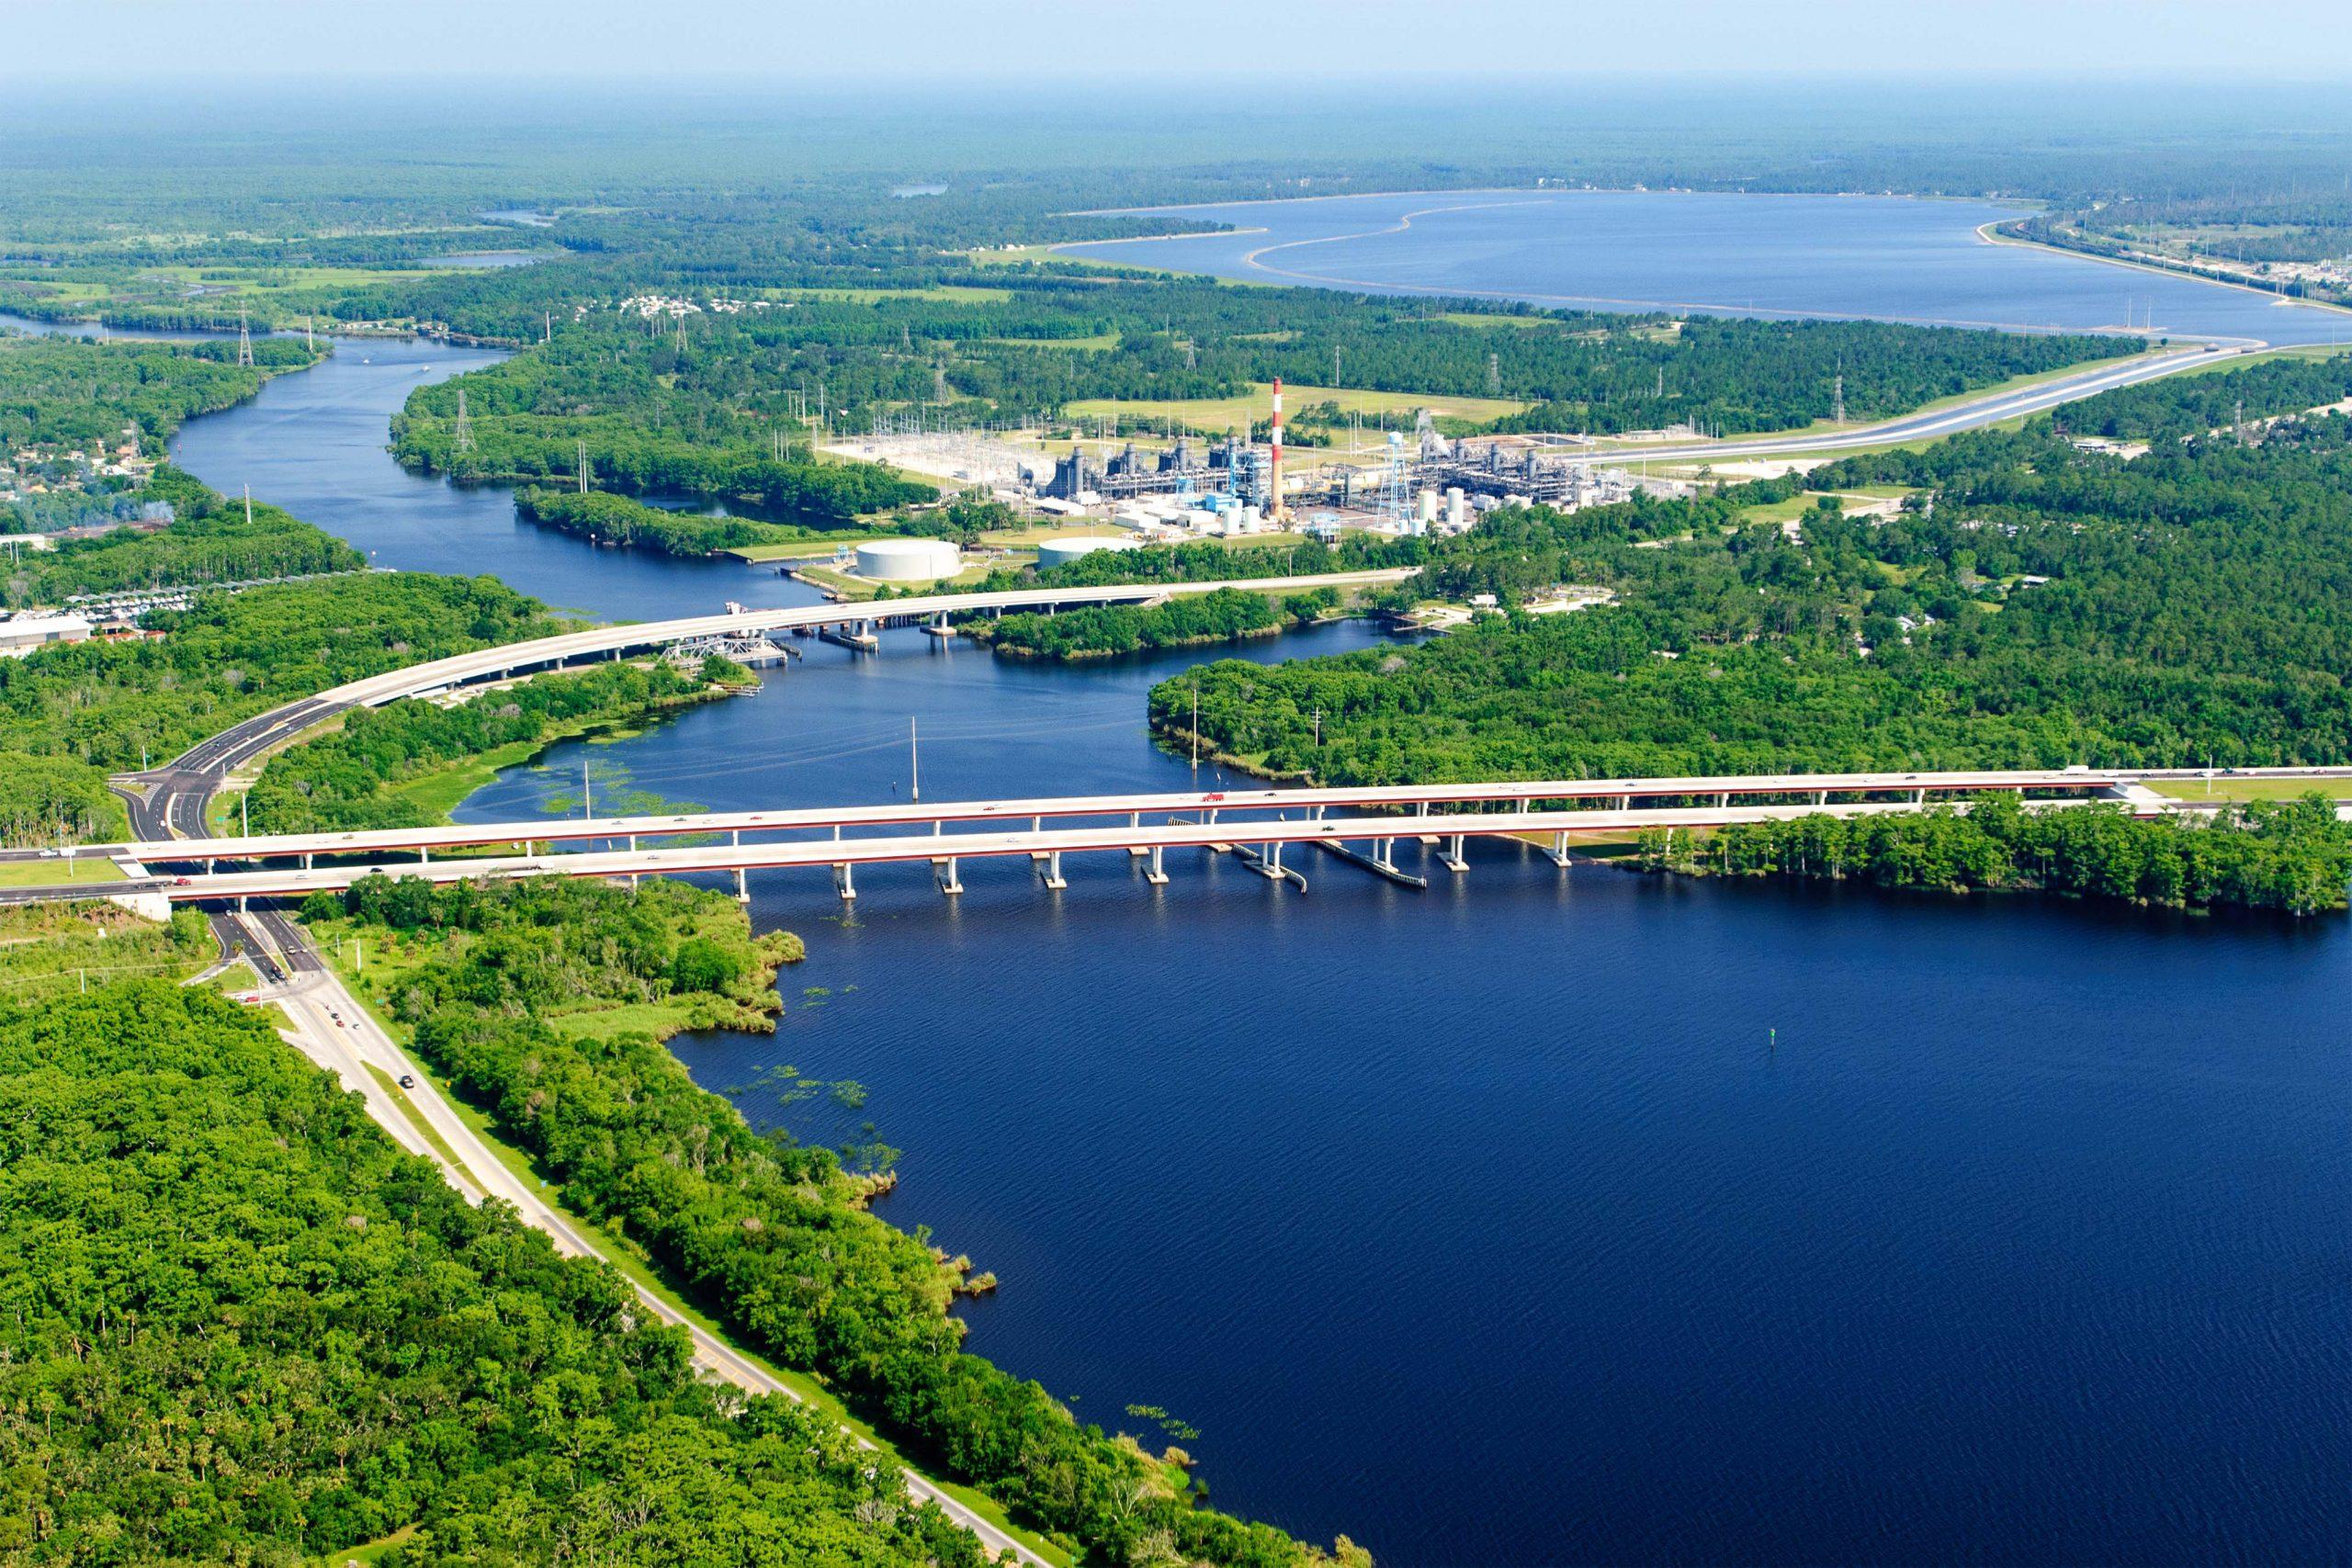 Interstate 4 crosses Lake Monroe where it meets the St. Johns River